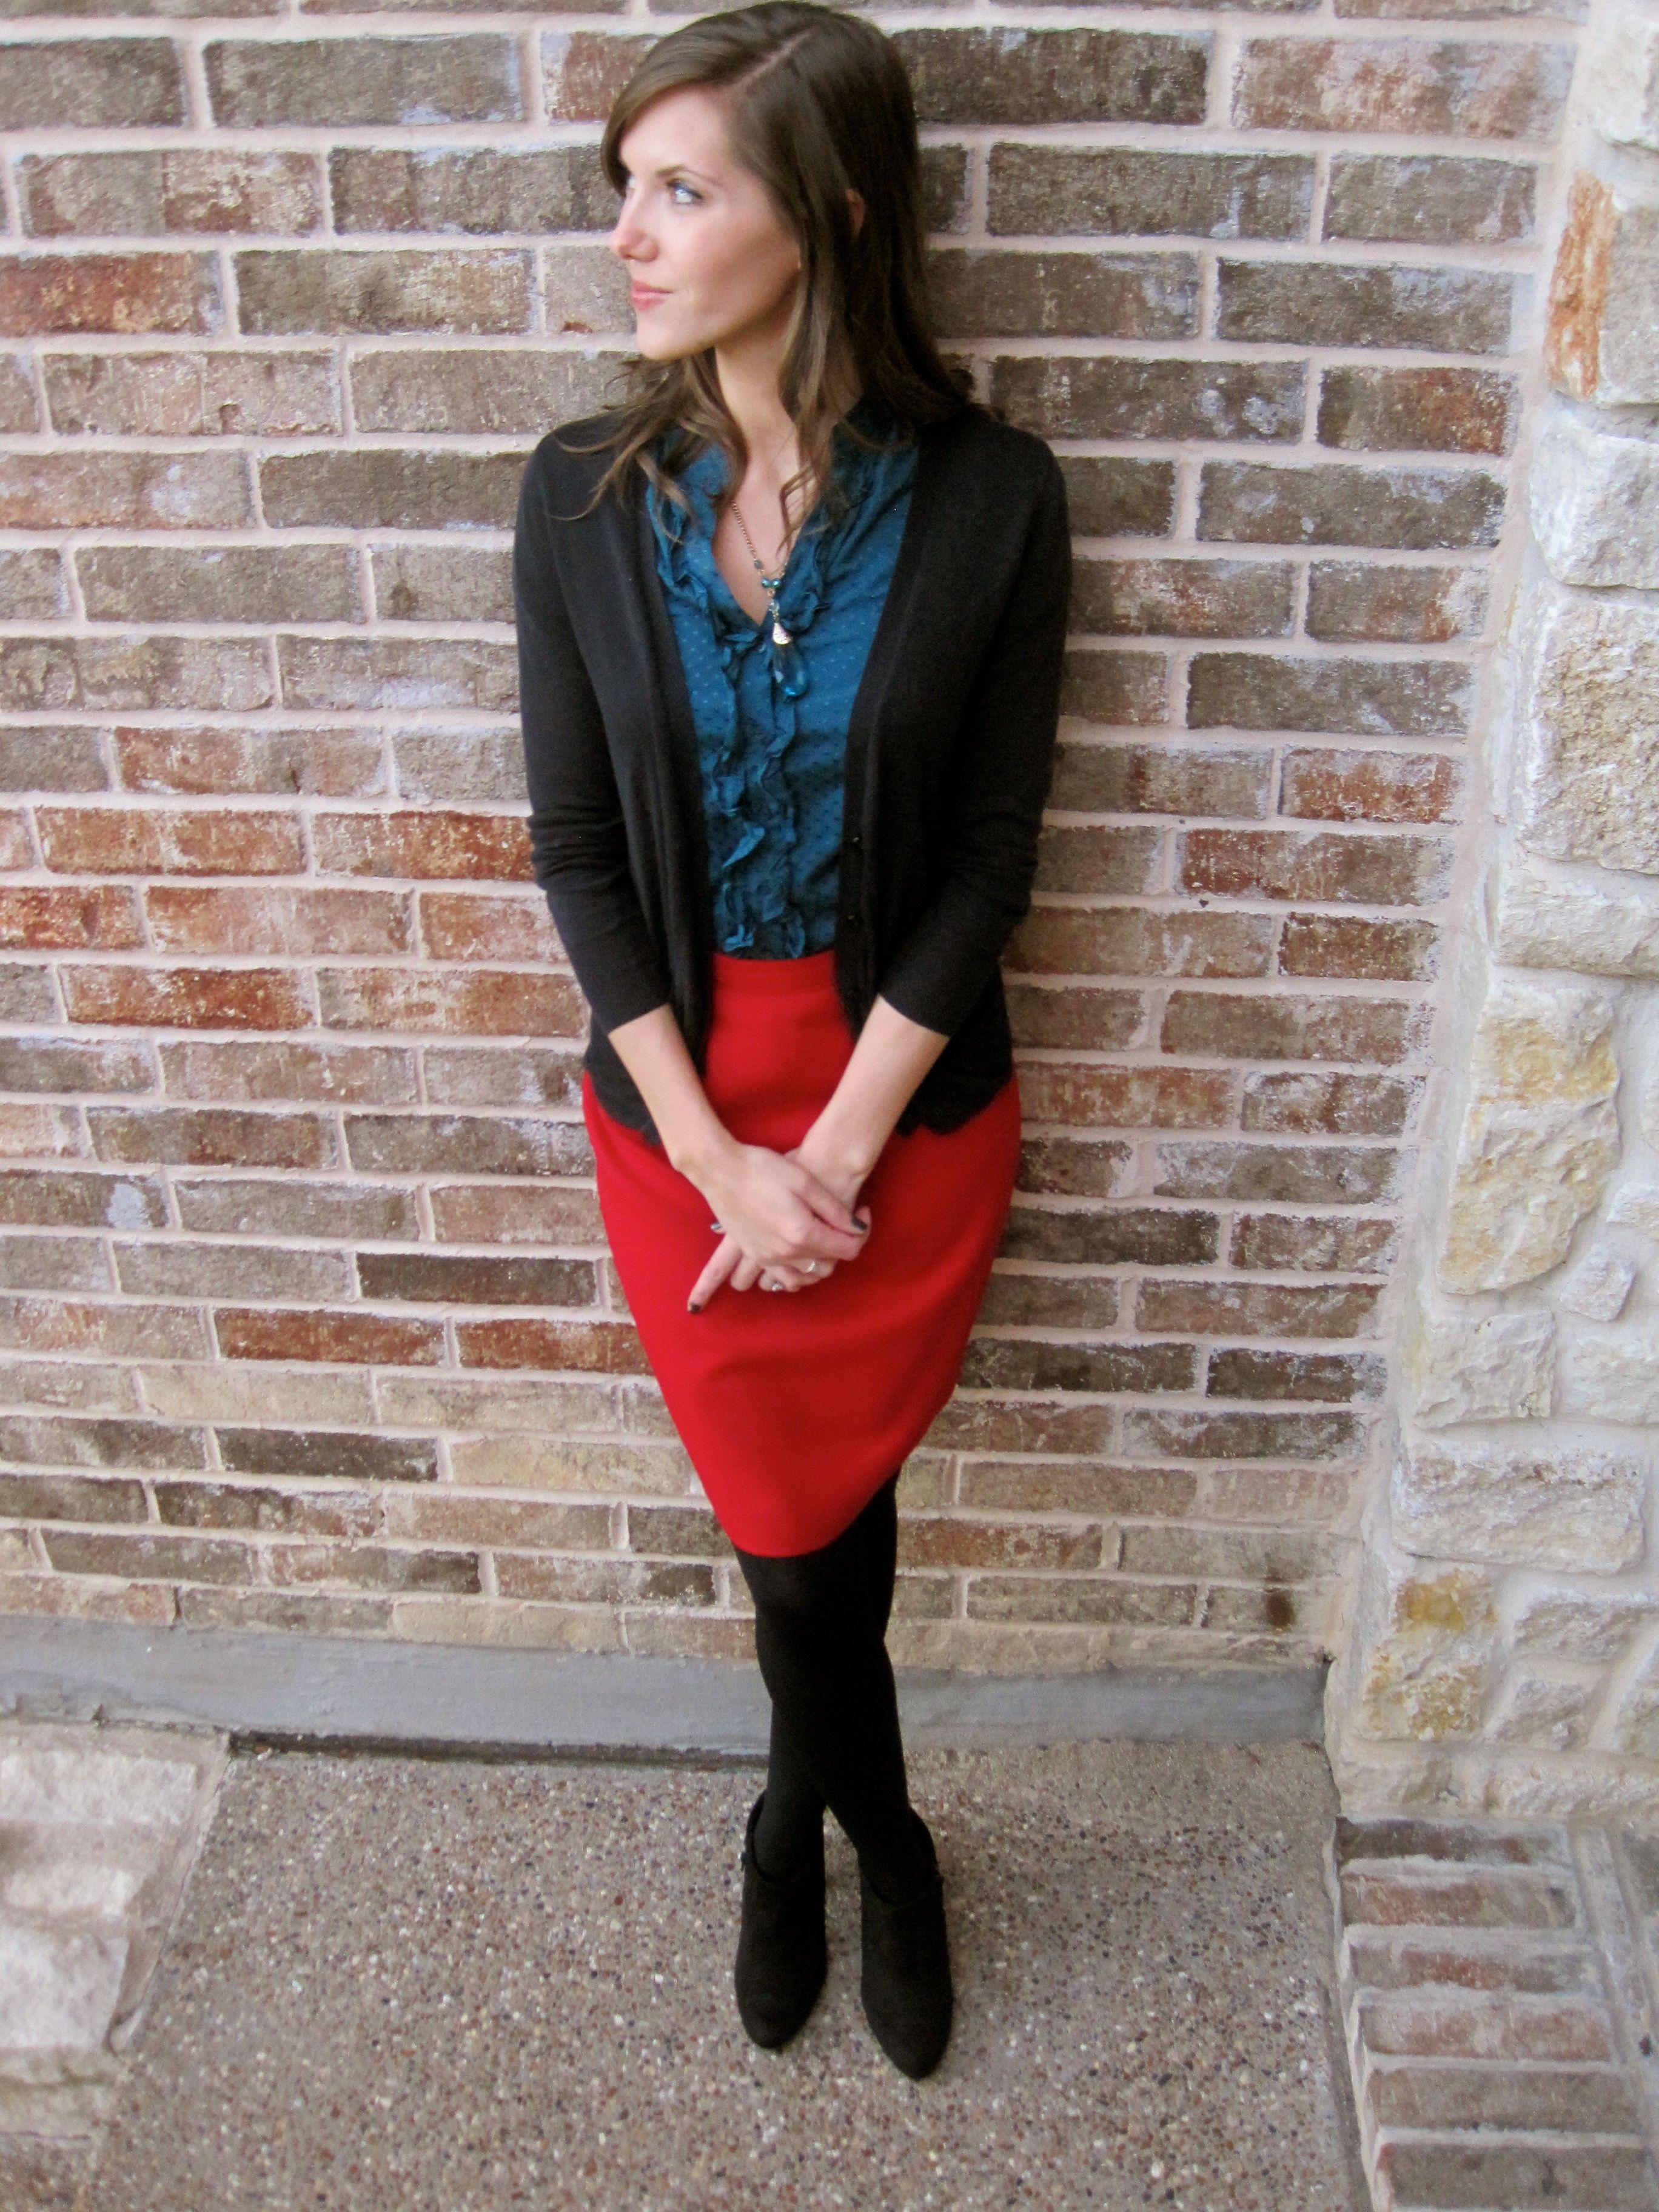 Red skirt, teal blouse, black cardigan (red   teal color block ...